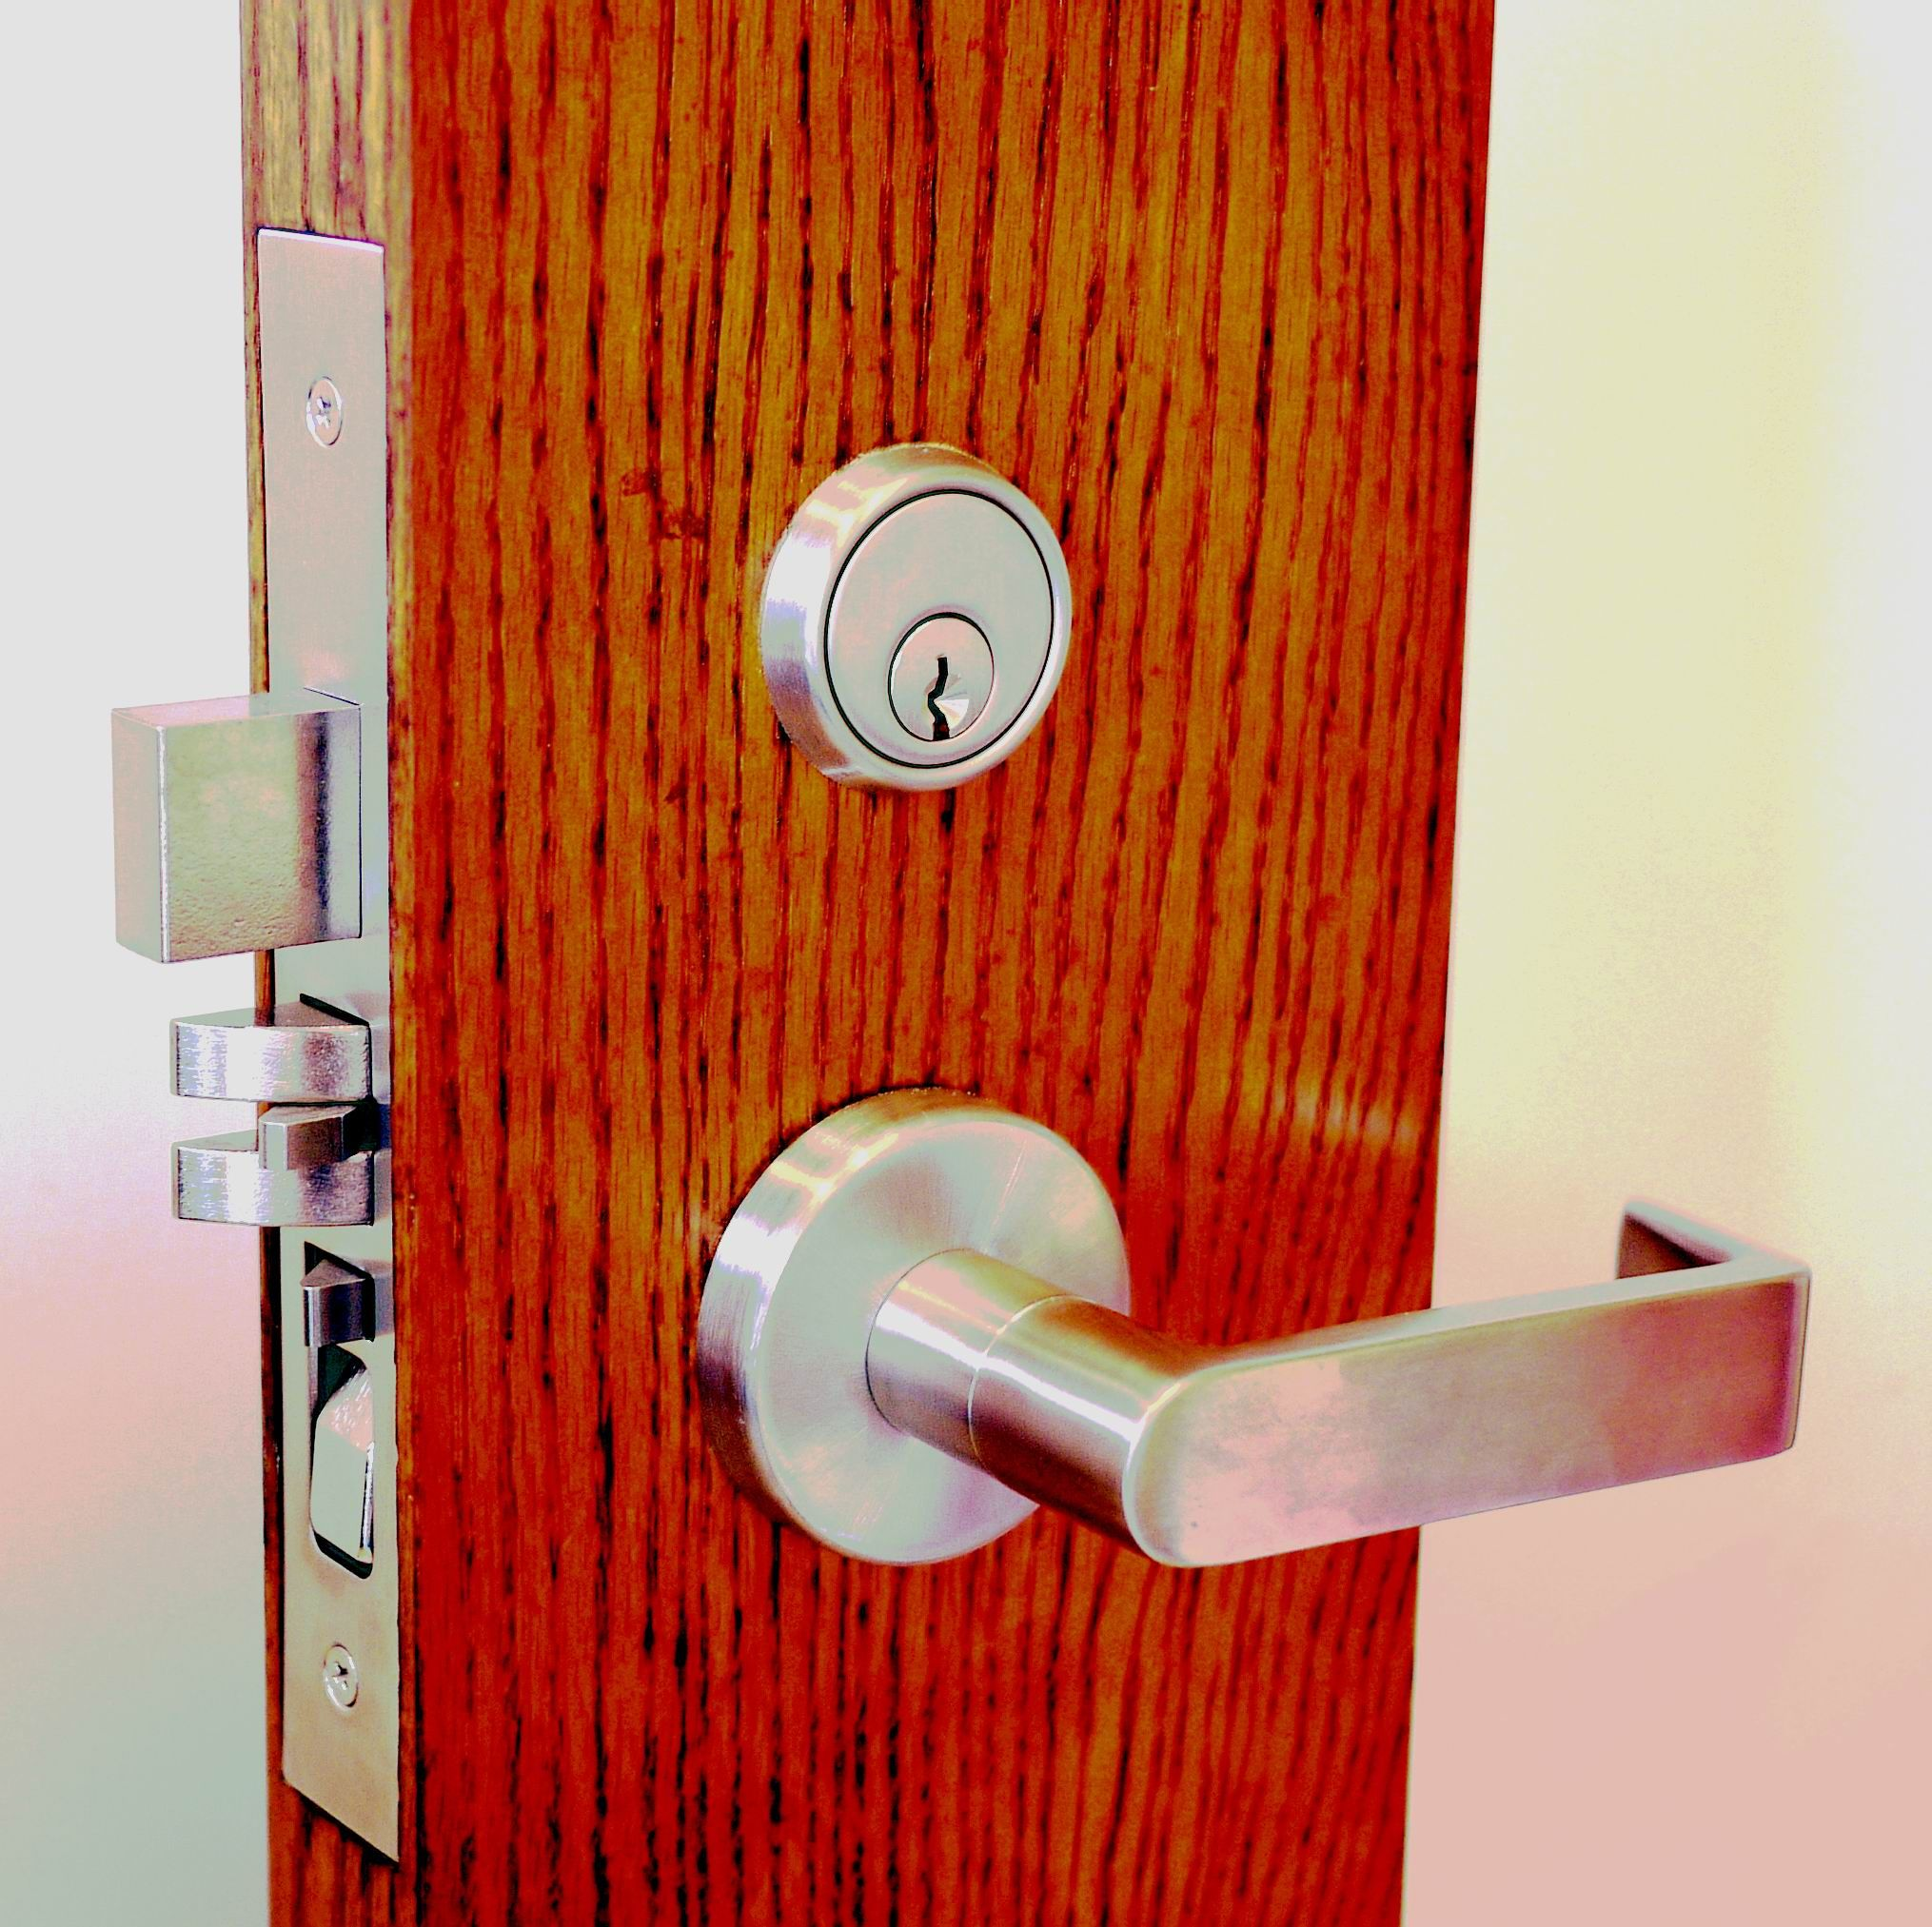 ANSI Grade 1 Mortise Lever Lock